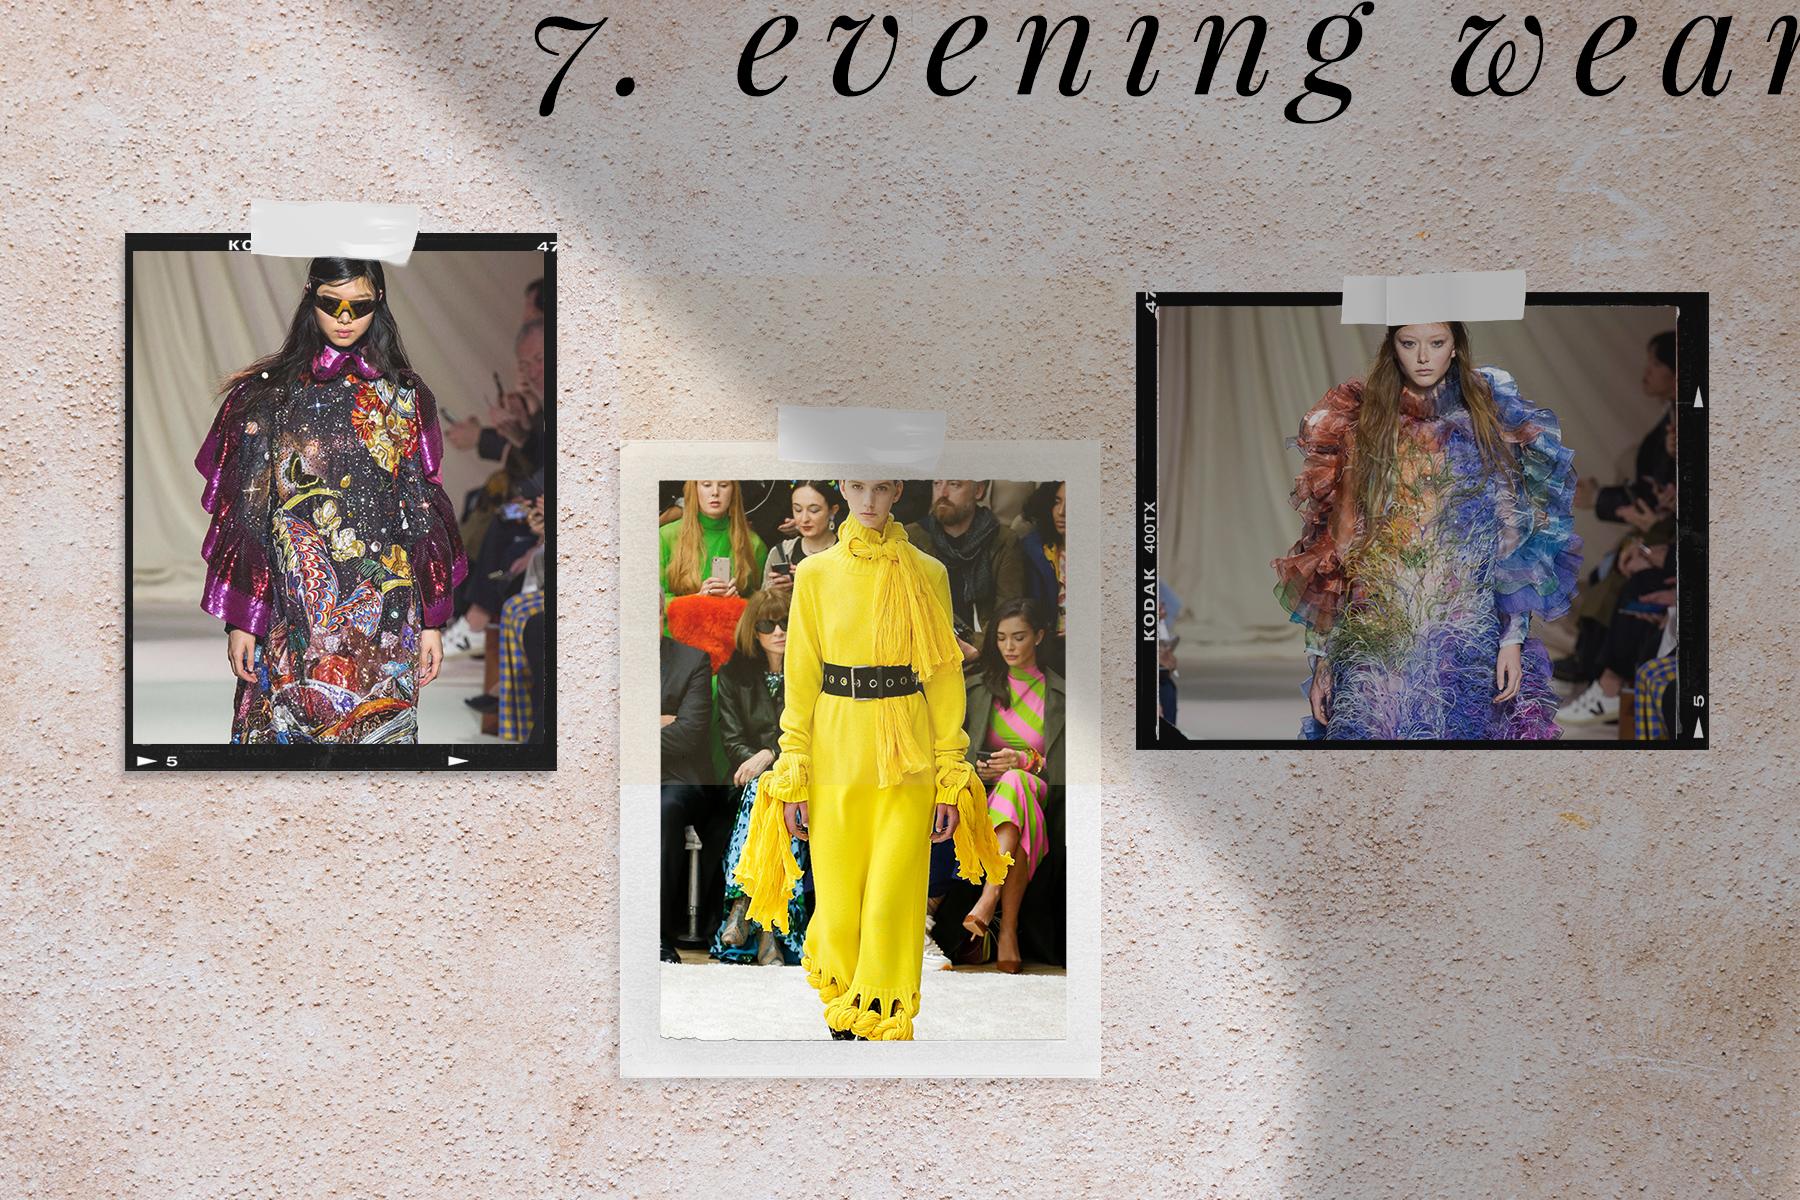 eveningwear.jpg